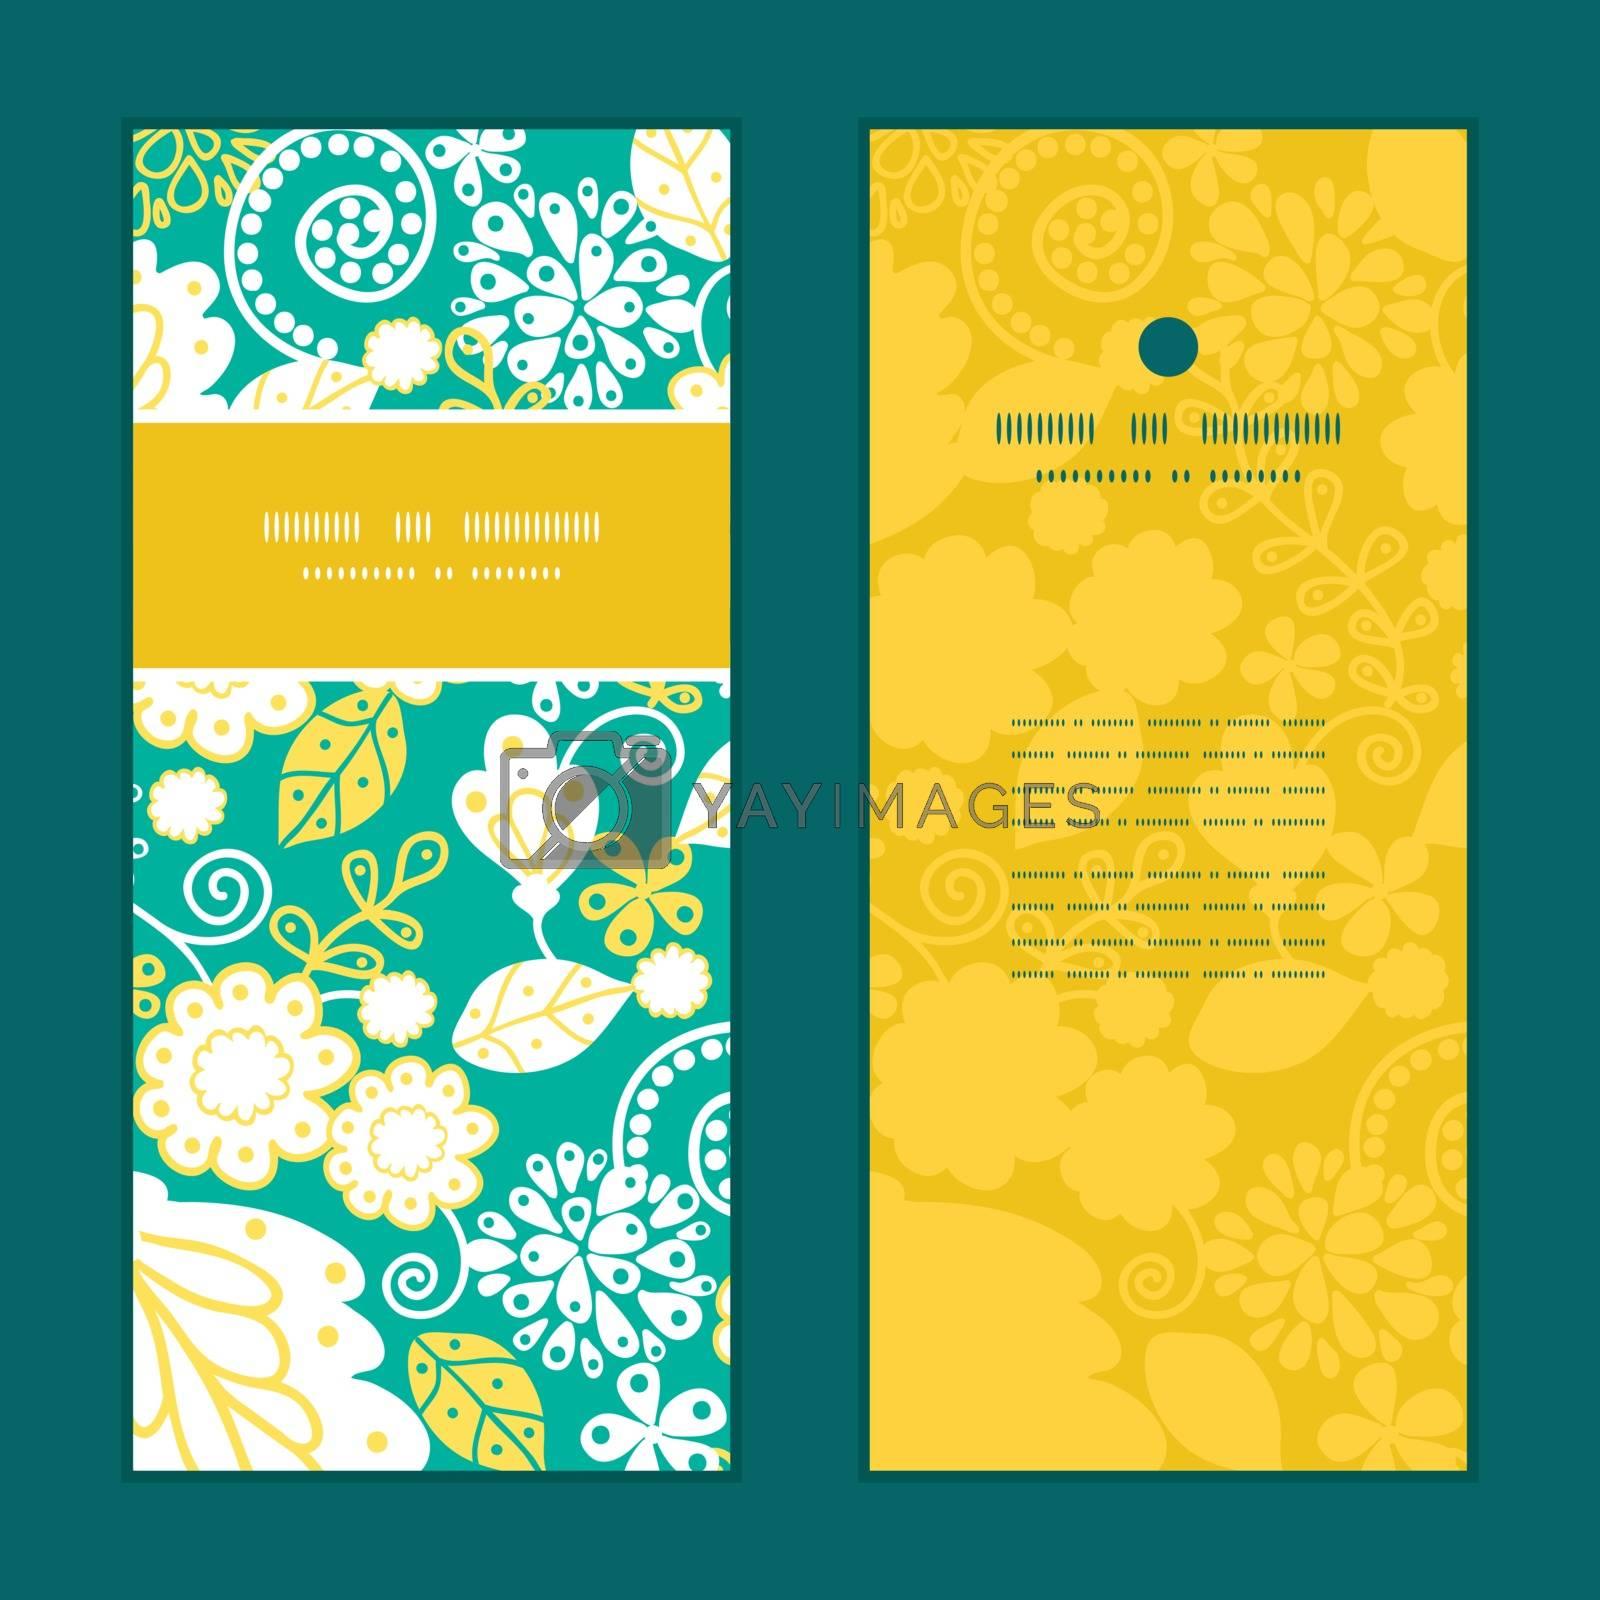 Vector emerald flowerals vertical frame pattern invitation greeting cards set graphic design